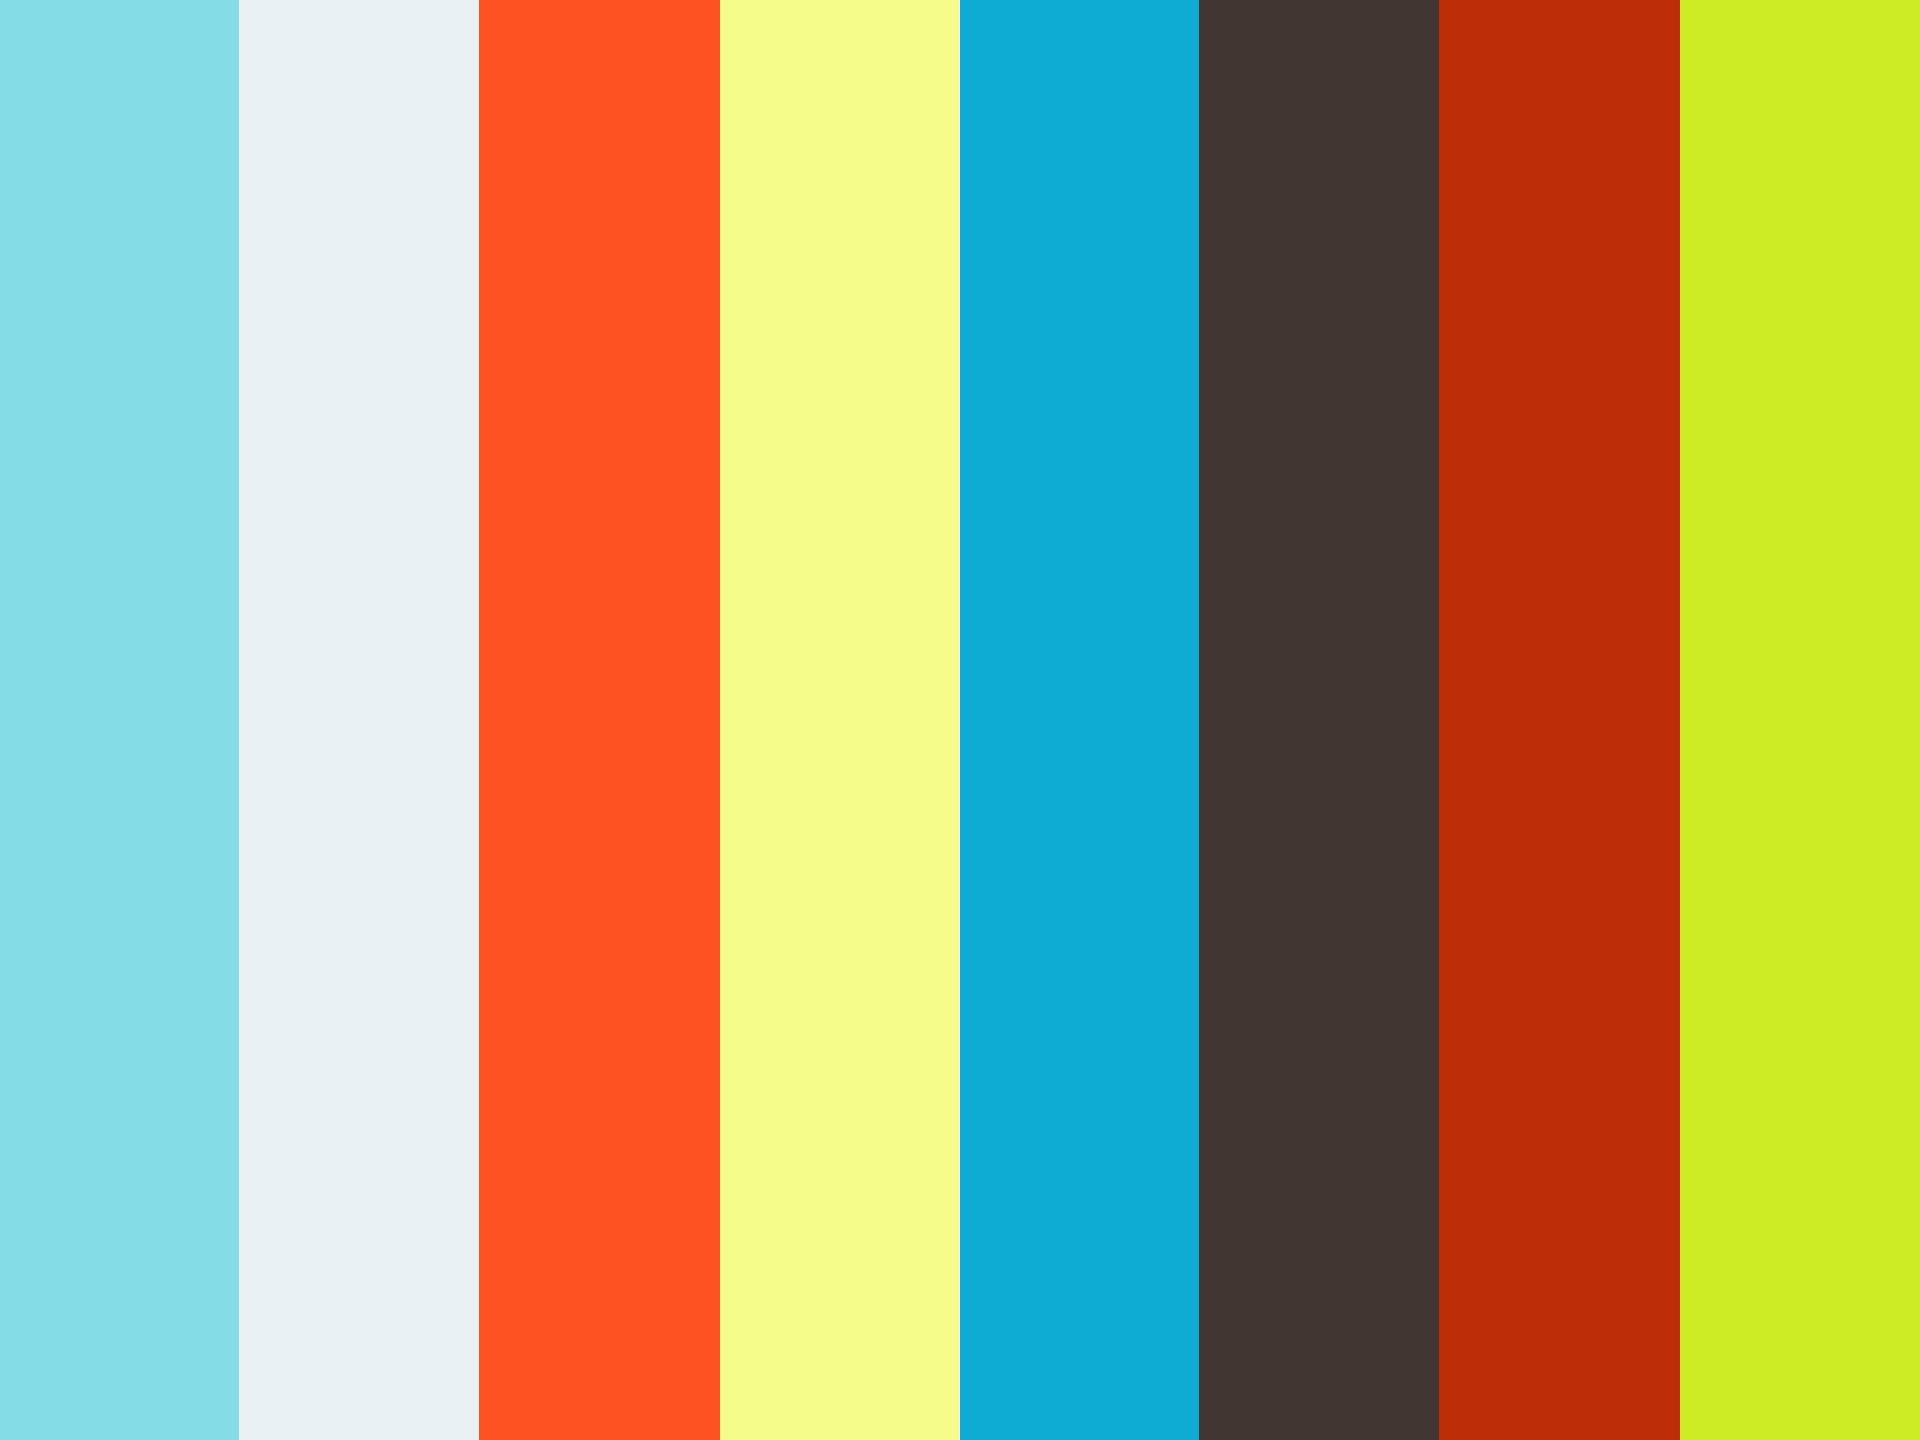 SHESOUTTAYOURLEAGUE ridden by CASEY DEARY - 2015 NRHA Futurity (Open Finals - Sec. 2)